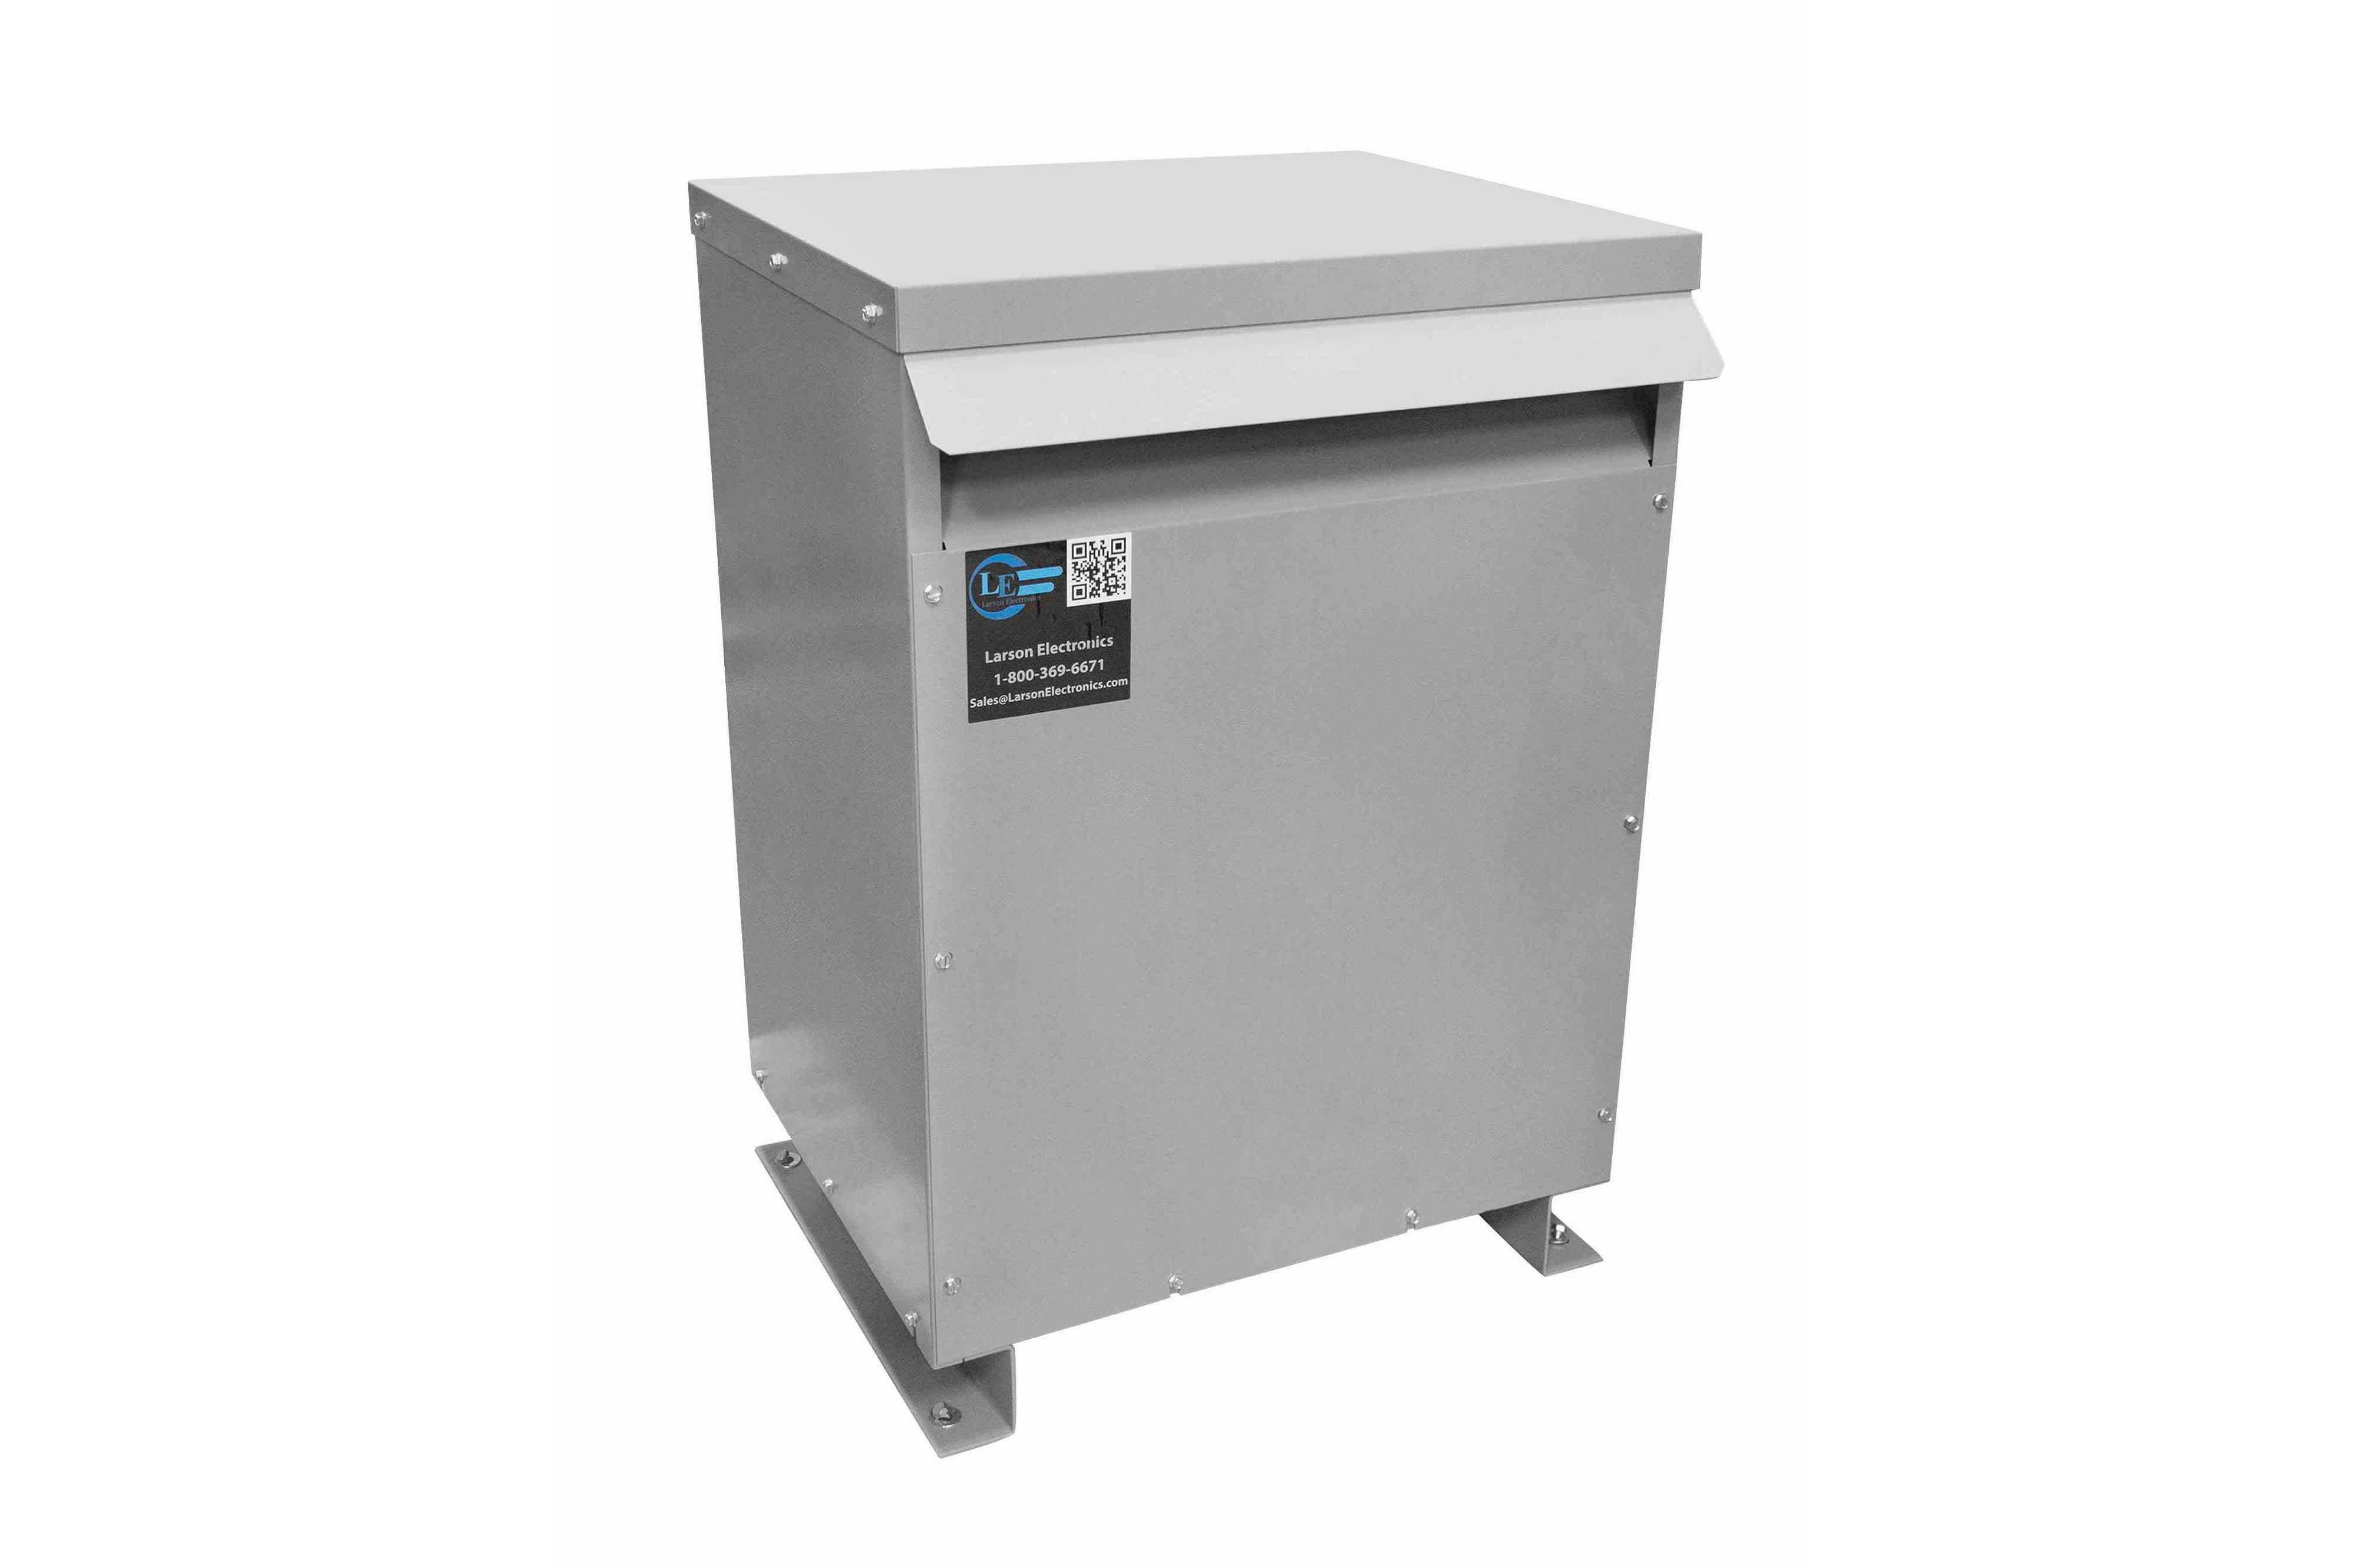 27 kVA 3PH Isolation Transformer, 208V Wye Primary, 240V/120 Delta Secondary, N3R, Ventilated, 60 Hz